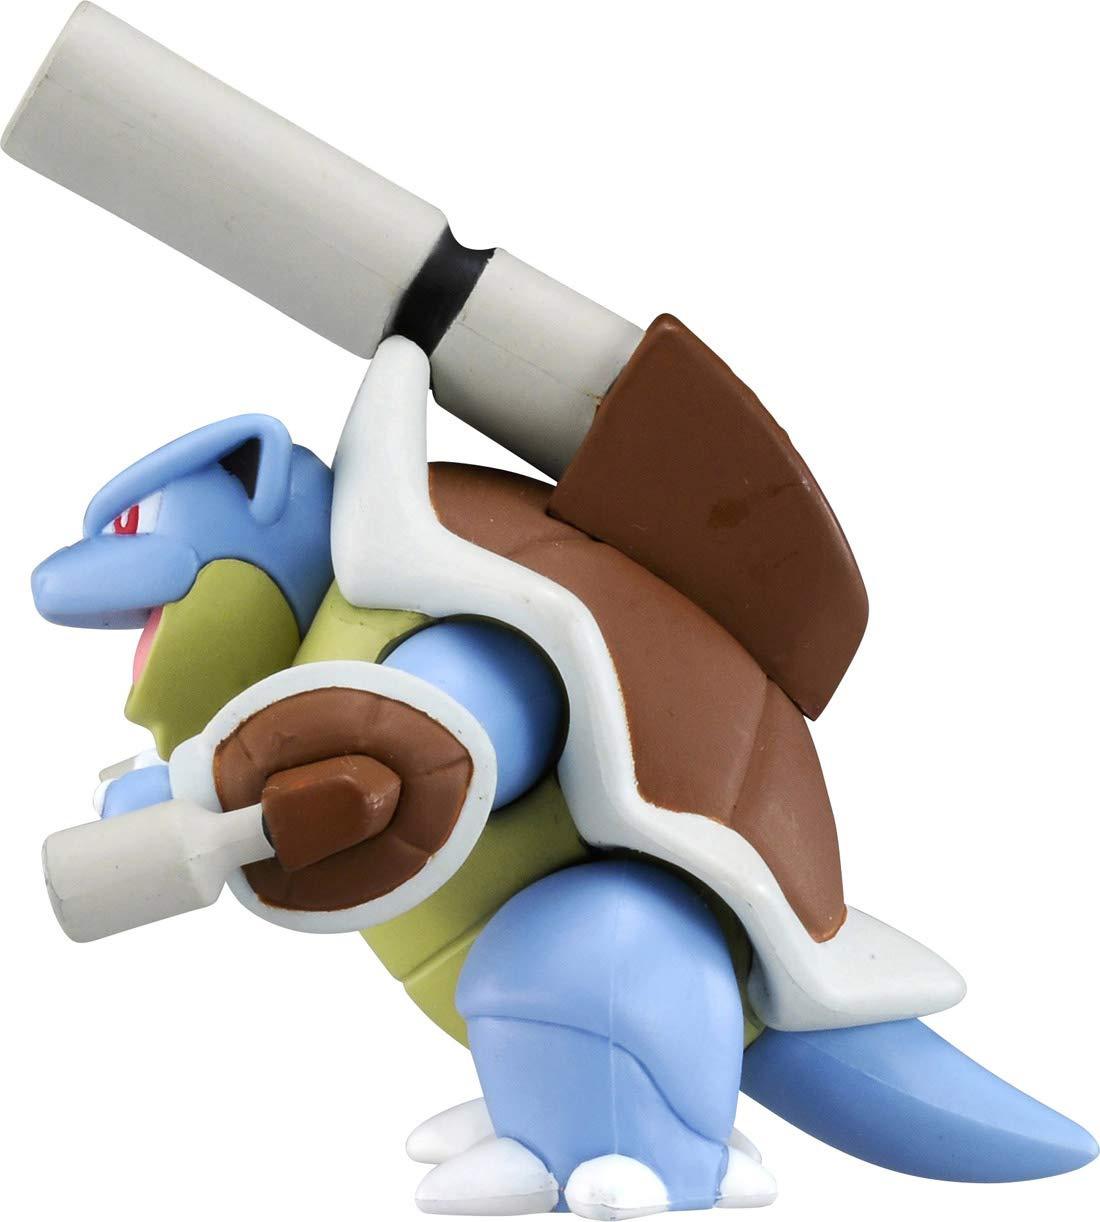 Pokemon Monster Collection Moncolle Mini Action Figure EX ESP_14 Mega  Blastoise Tortank Turtok Kamex by TAKARA TOMY - Shop Online for Toys in Fiji